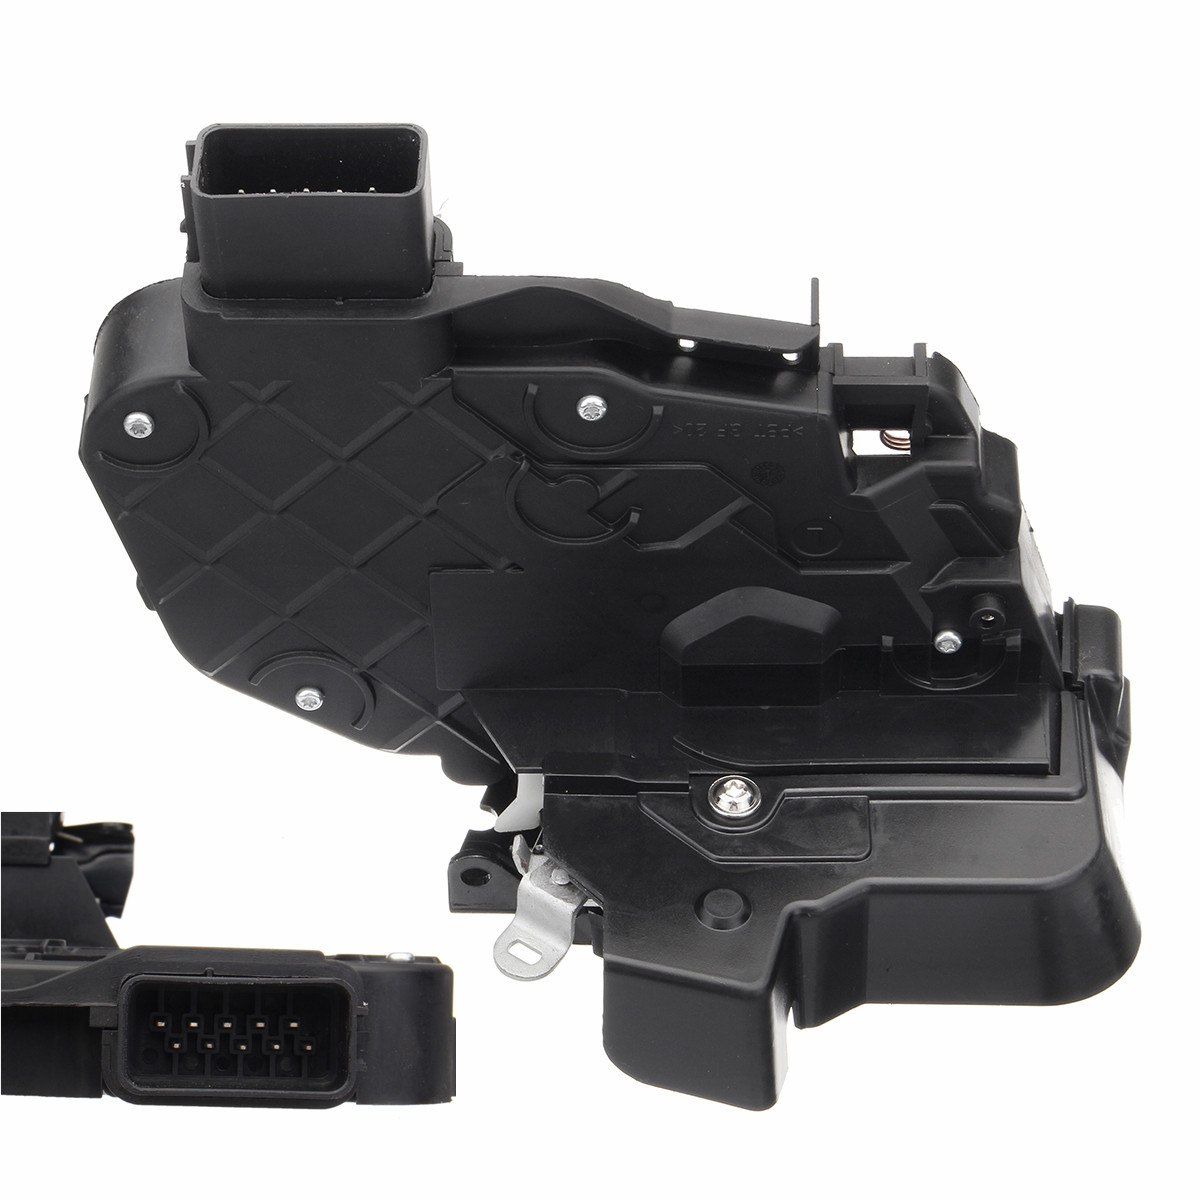 Front/Rear Left/Right Car Door Lock Latch Mechanism Actuator For Land Rover Freelander Evoque Locks Hardware Aftermarket